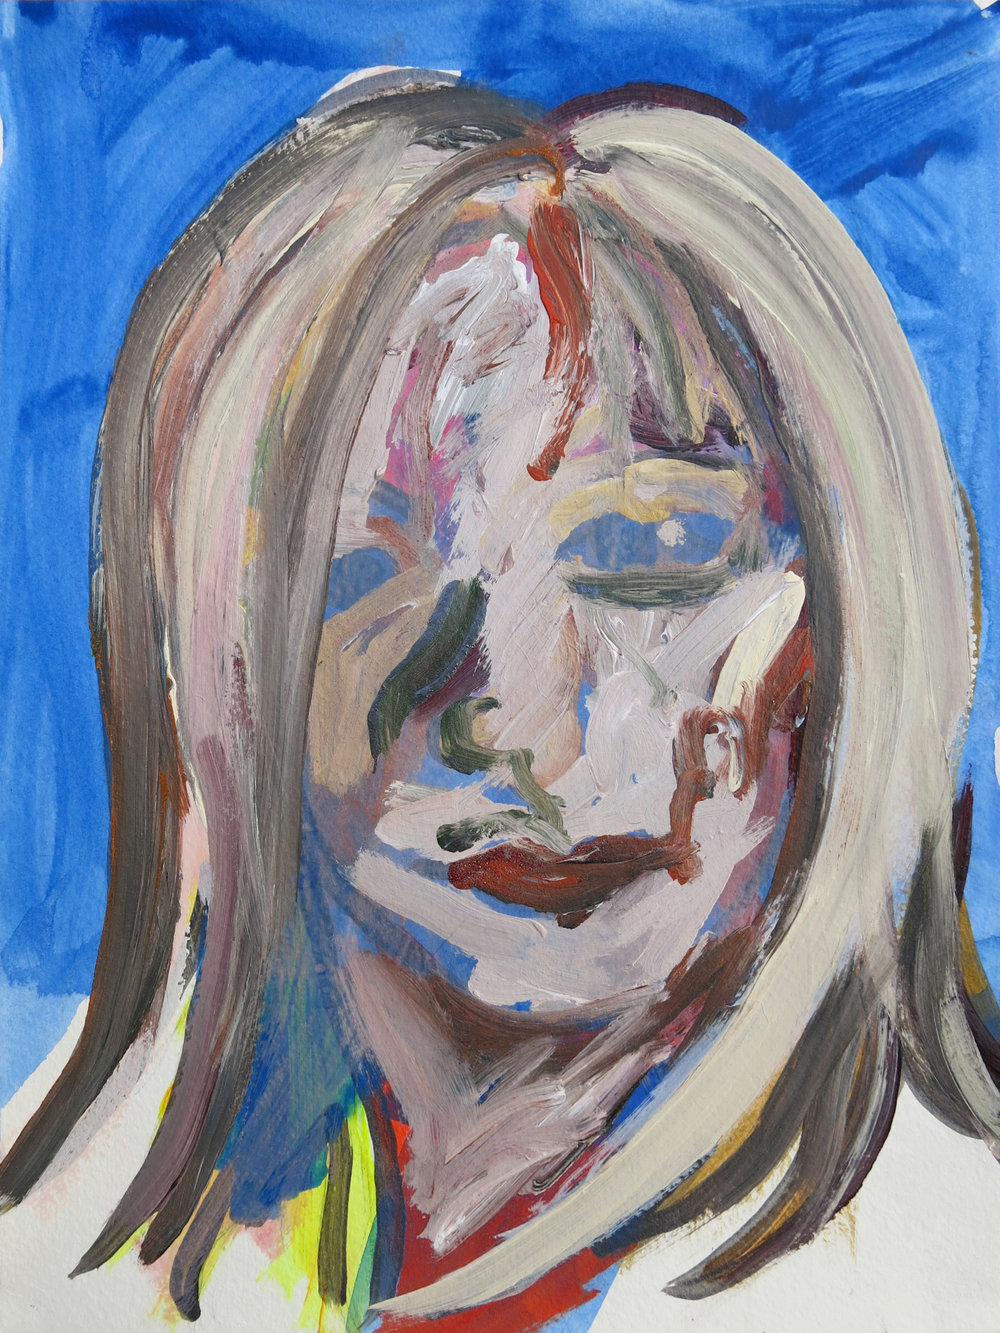 Barbra Streisand Portrait #20